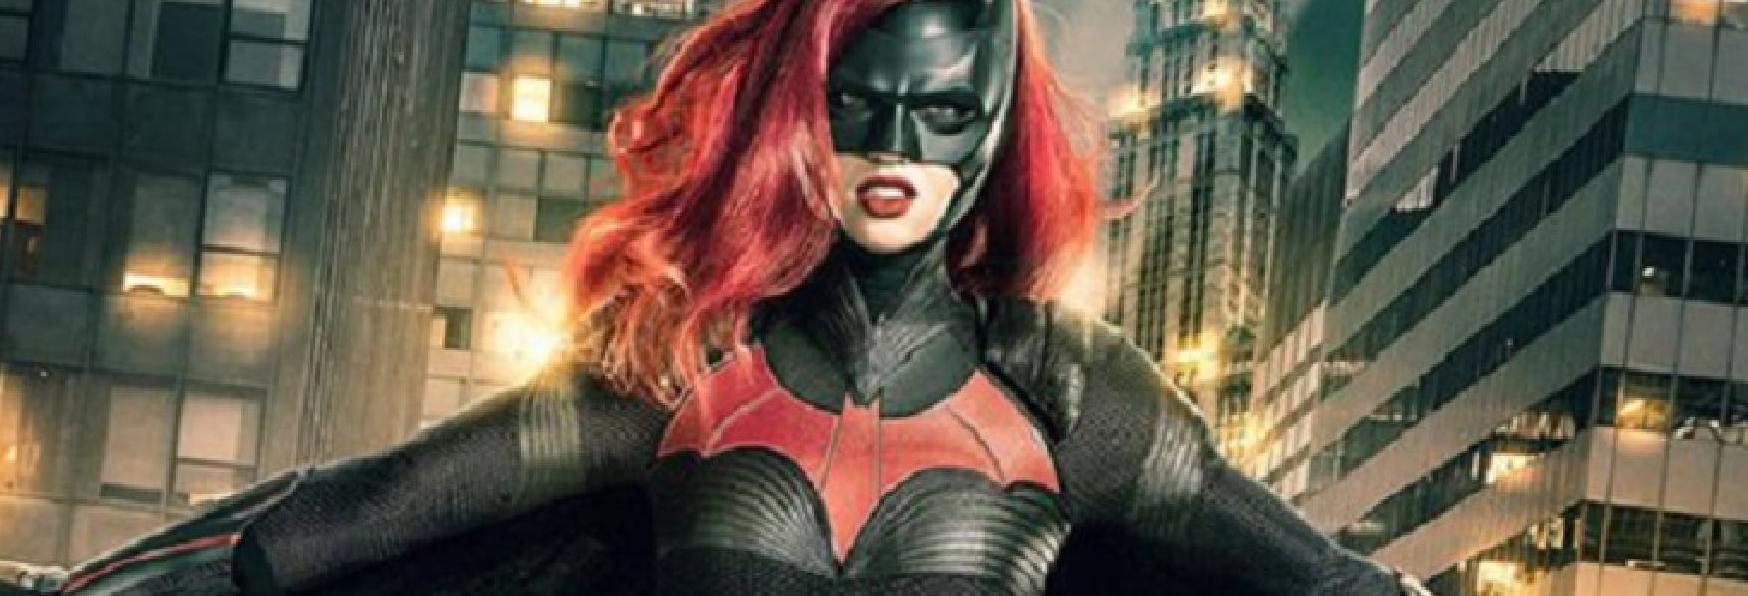 Crisis on Infinite Earths: Batwoman si unisce al Team nella nuova Anteprima